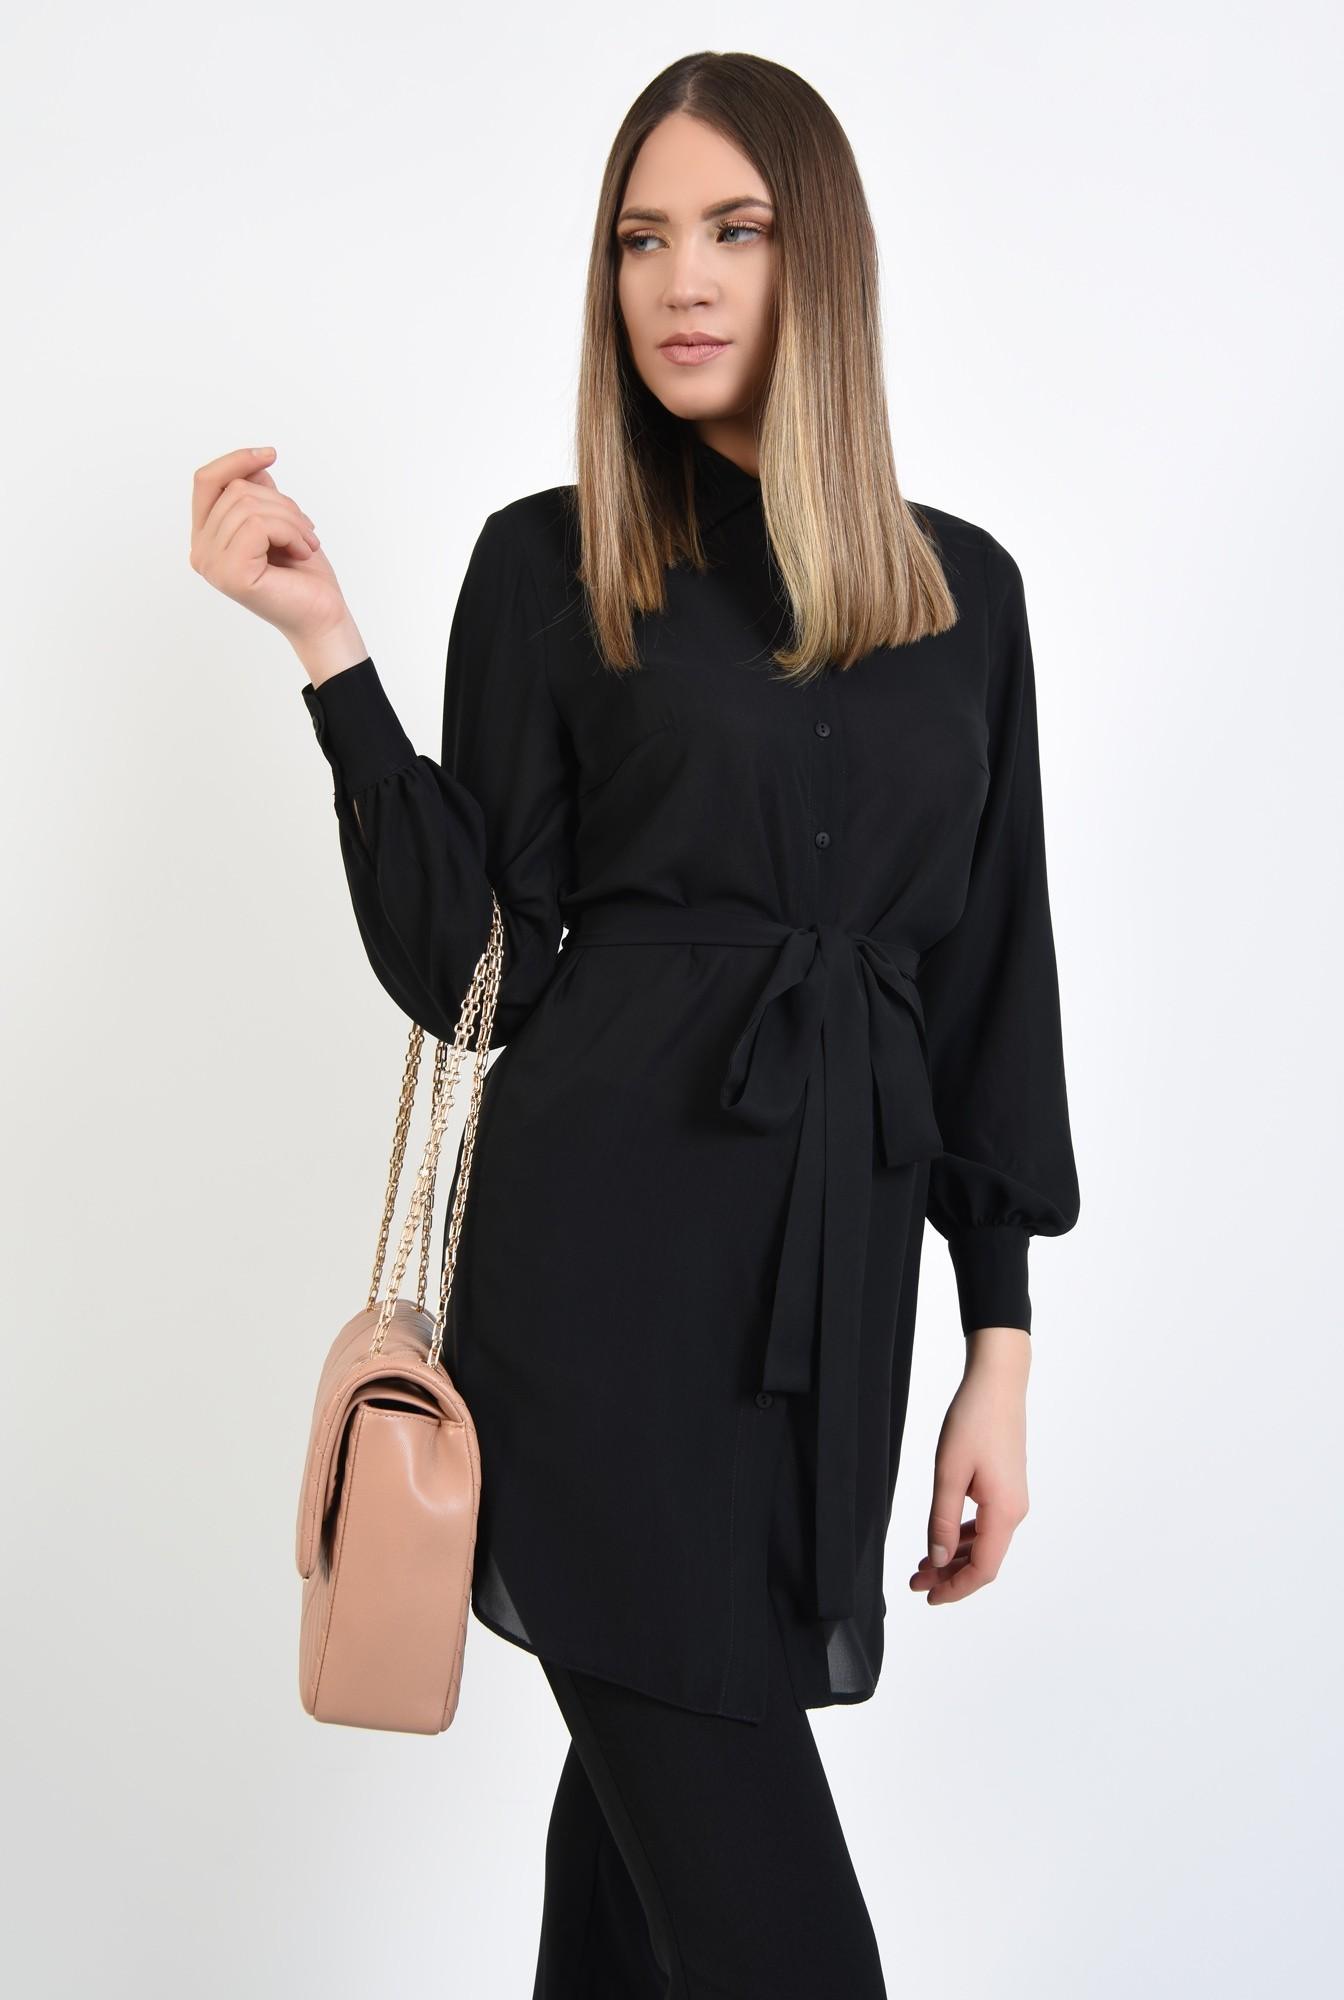 2 - camasa lunga, neagra, cu cordon, funda la talie, tunica